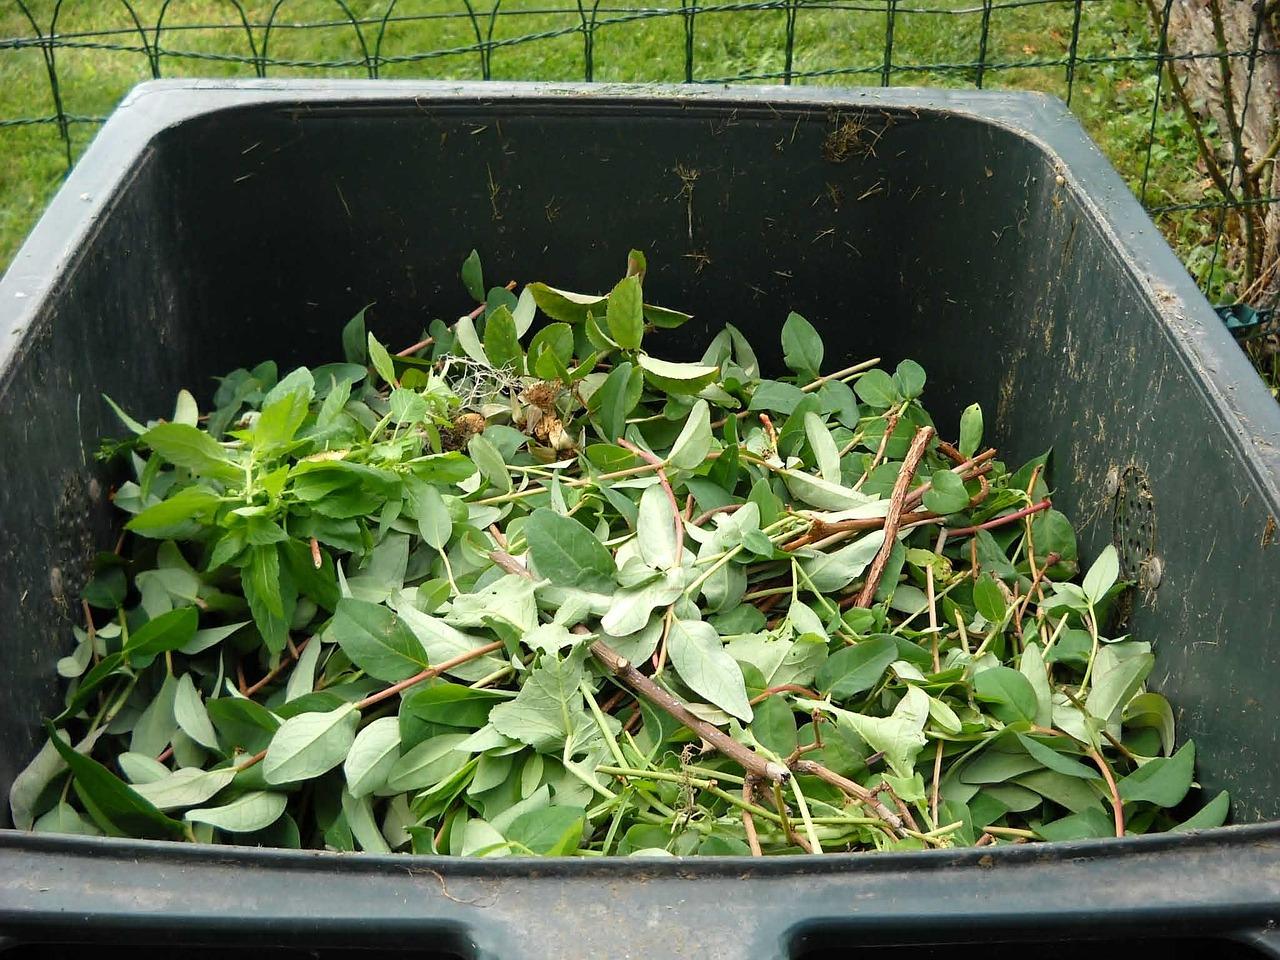 green-waste-486011_1280.jpg